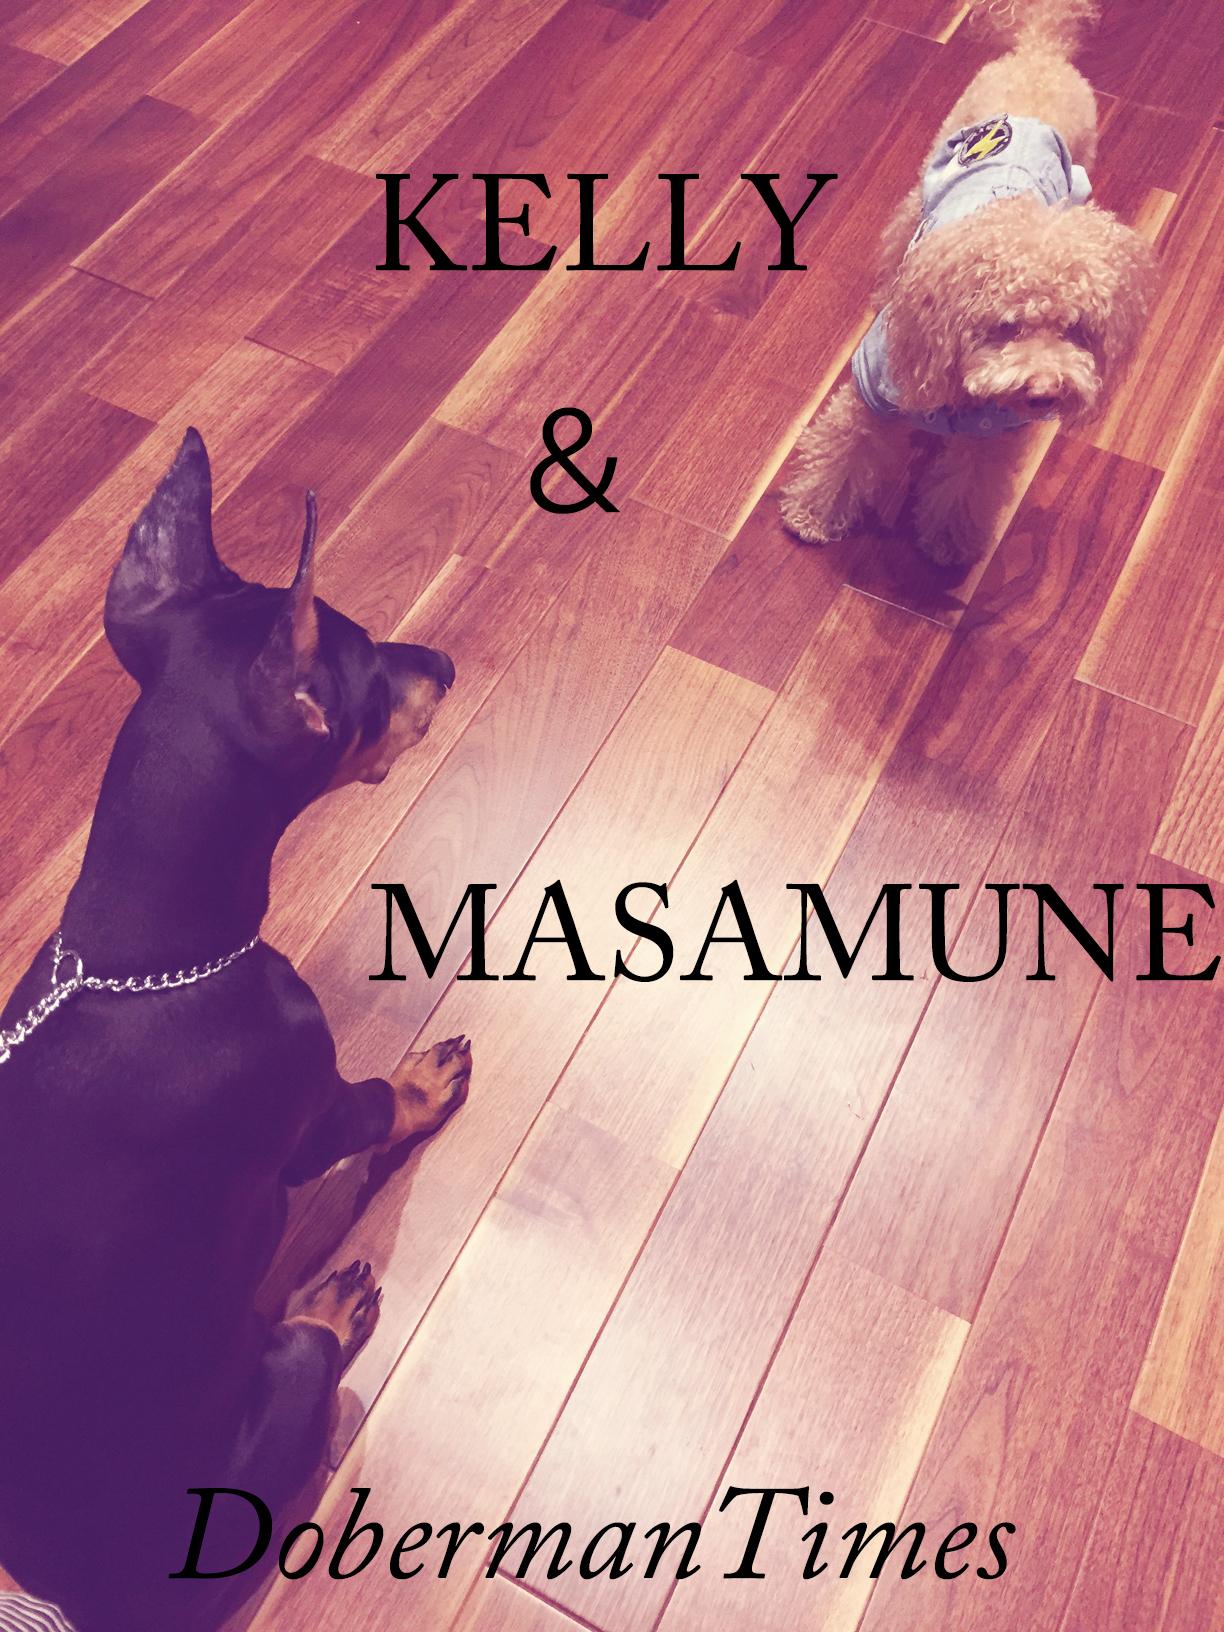 KELLY(8歳・♂)&MASAMUNE(4ヶ月・♂)